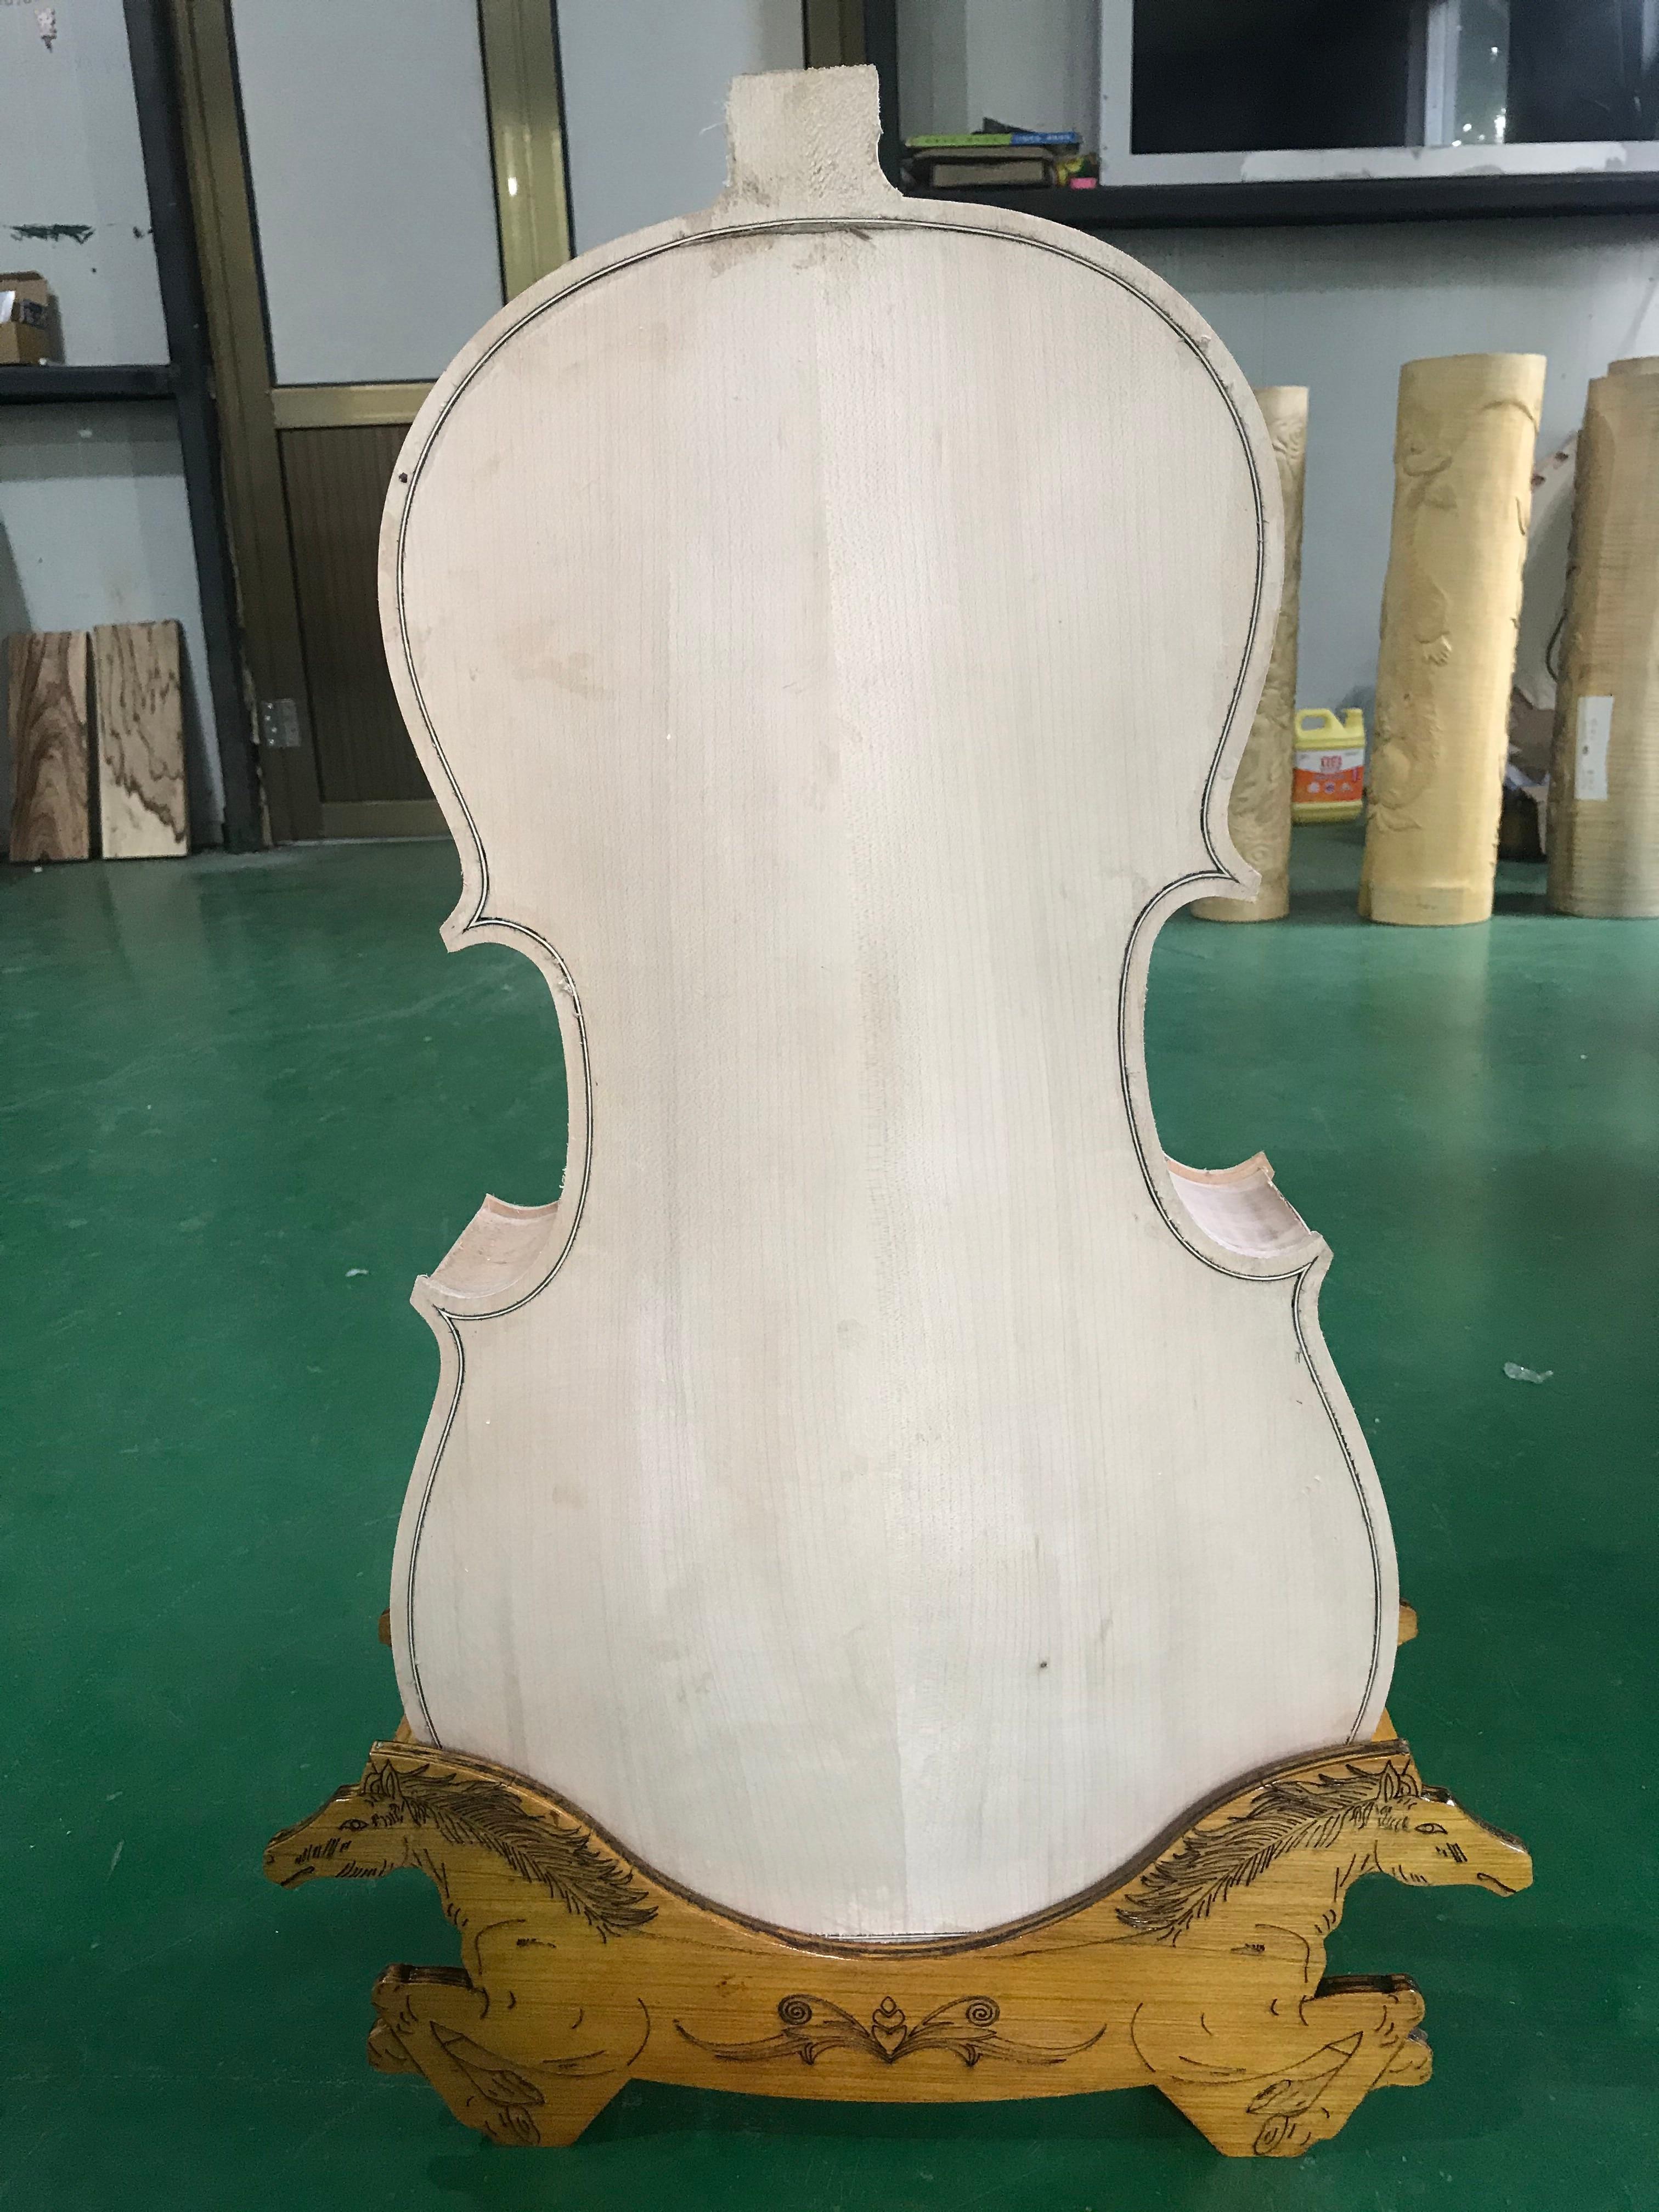 1 PCS Cello Body Handmade Unfinished Semi-finished 4/4 3/4 1/4 1/2 1/8 White Cello Body Without Neck Spruce Panel Maple Back enlarge